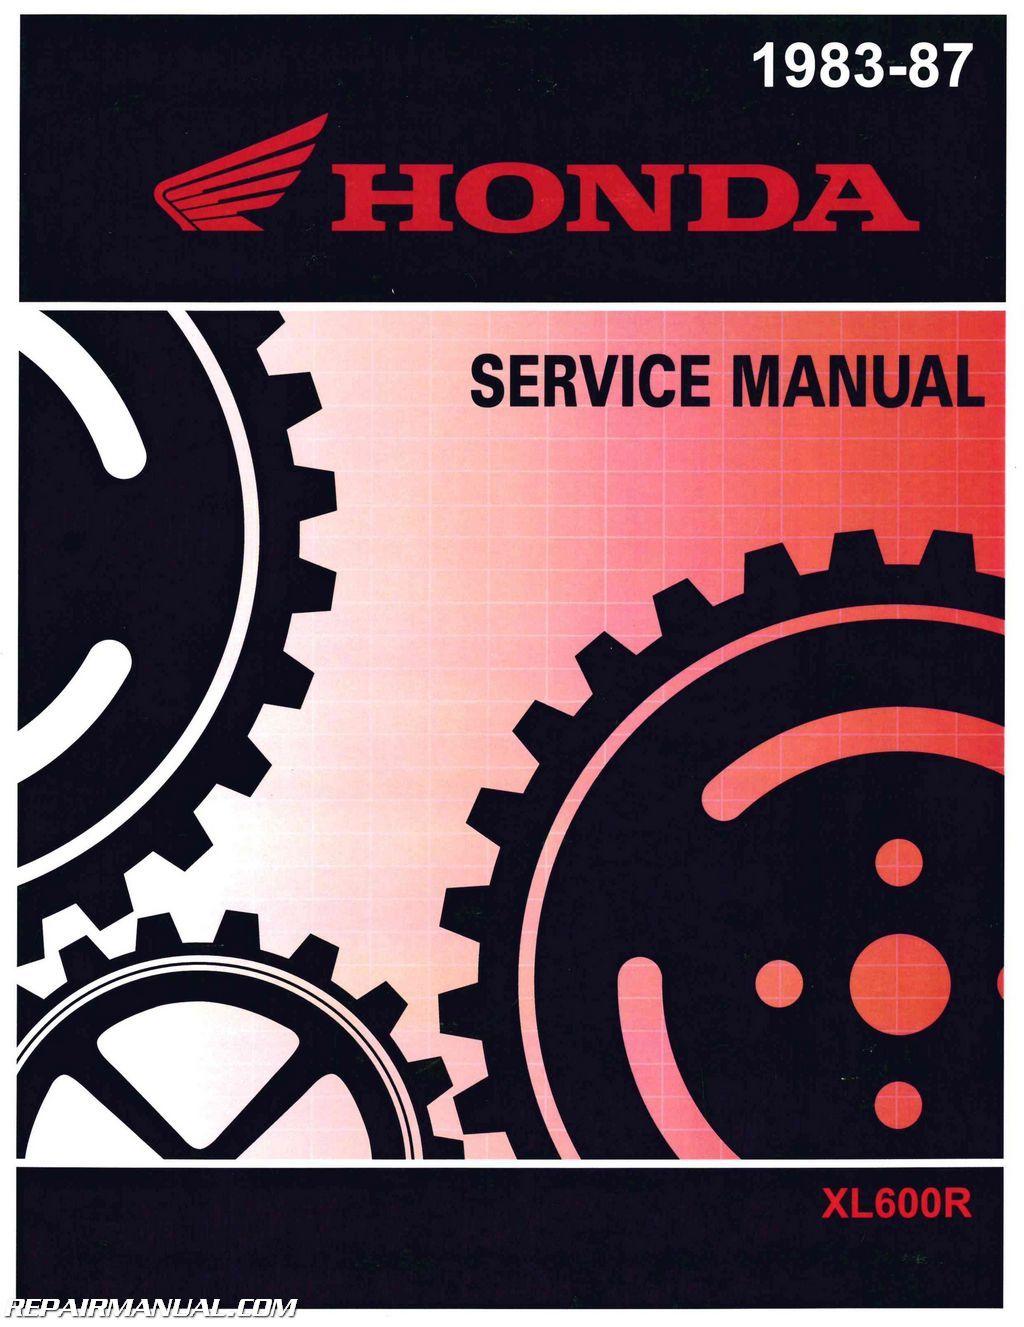 1986 honda xl600r service manual pdf 1 projekty na vyskanie 1986 honda xl600r service manual pdf 1 fandeluxe Choice Image